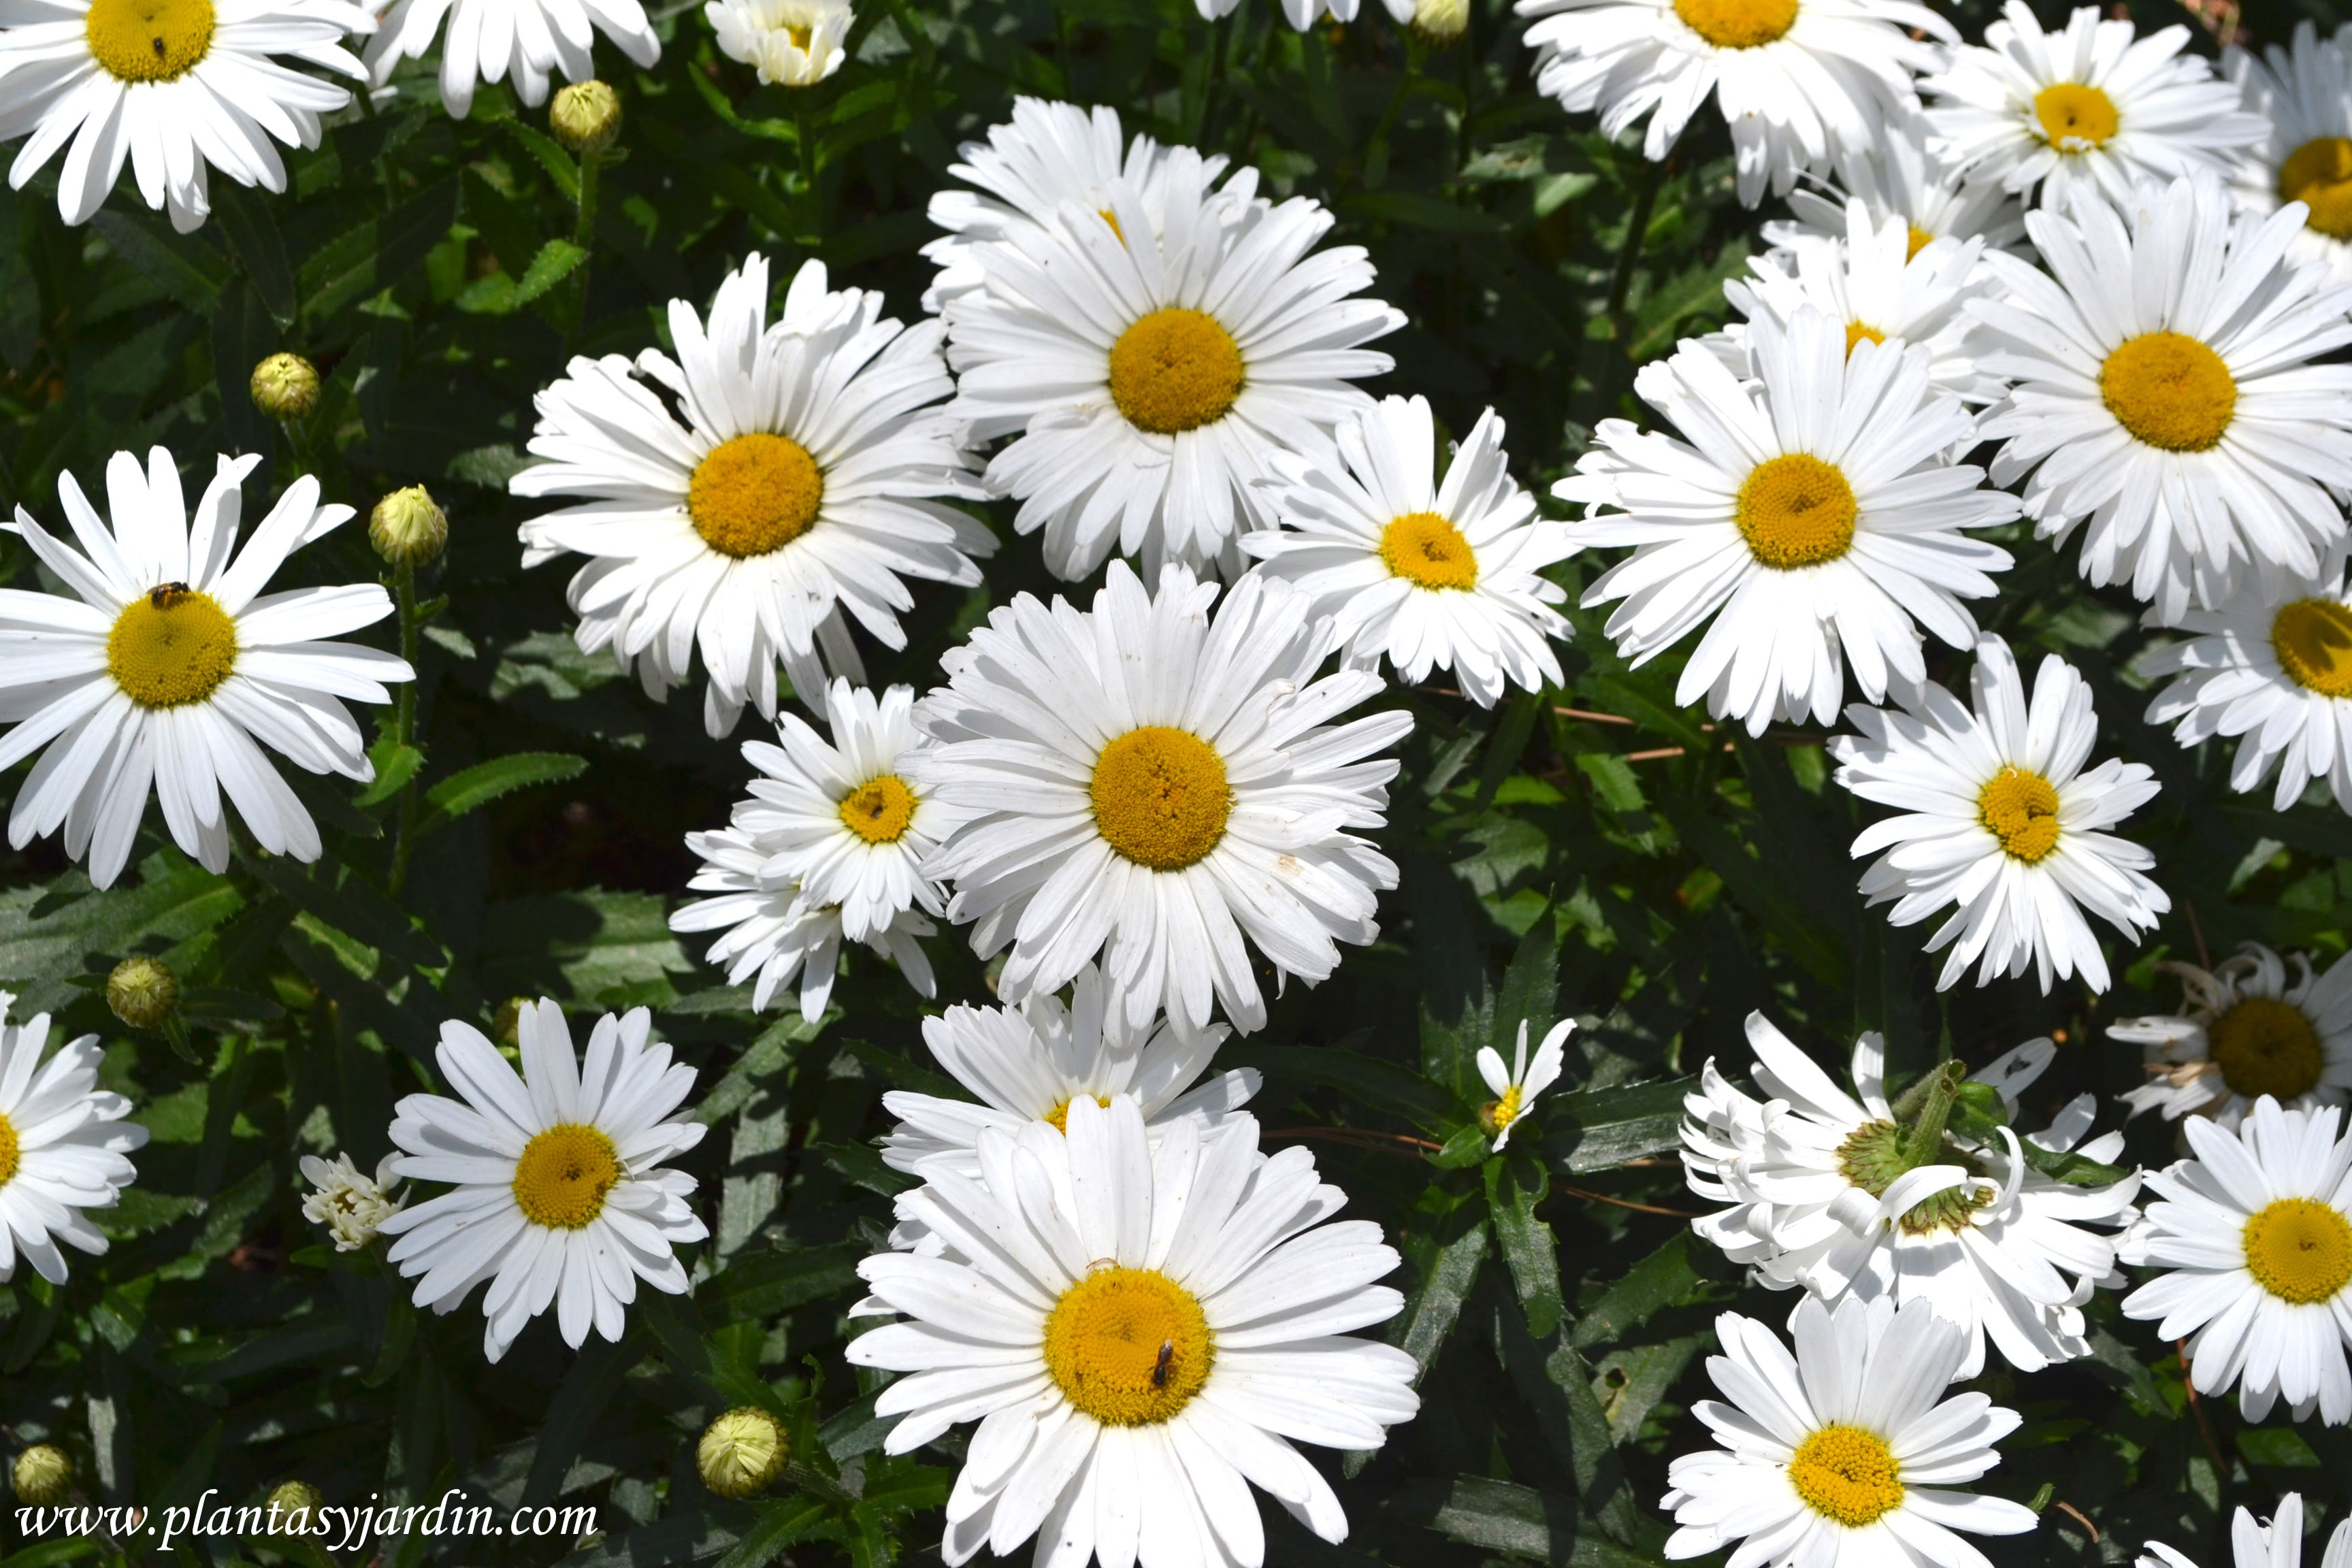 Bellis perennis- Margarita común, florecida en plena primavera